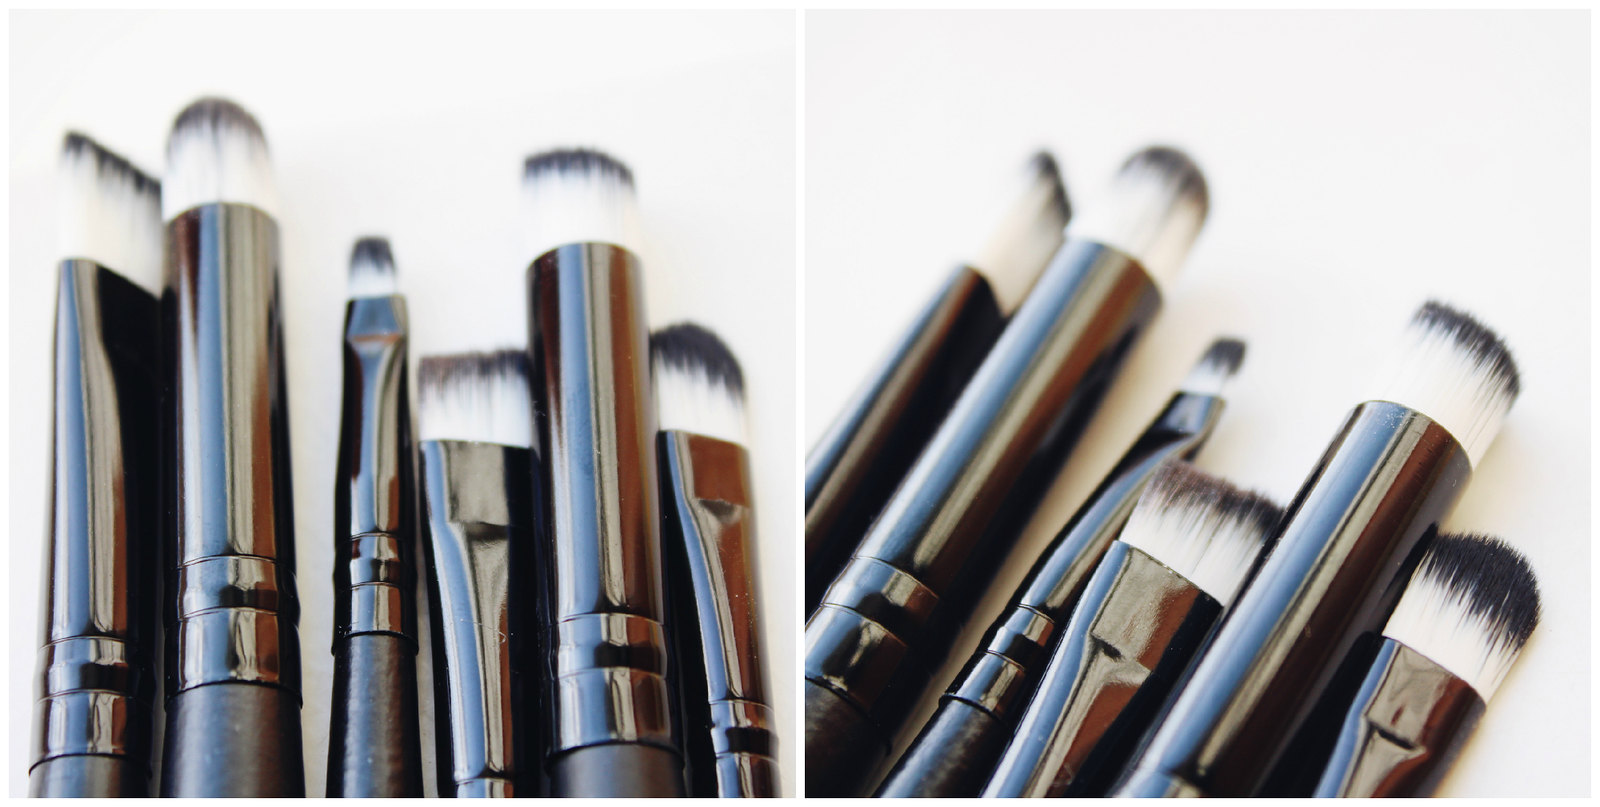 eye-shadow-brushes